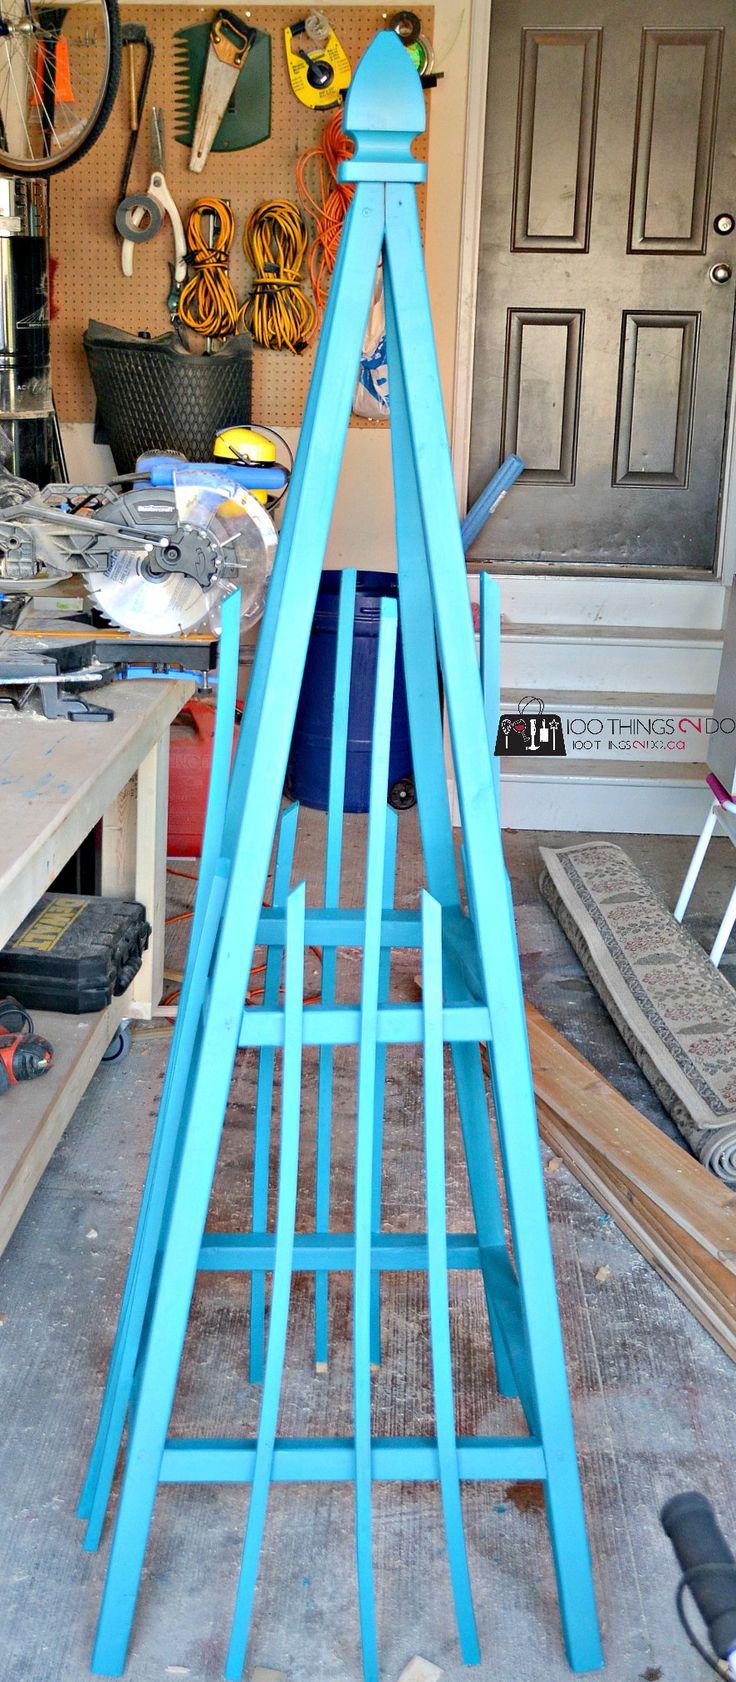 French tuteur trellis woodworking projects amp plans - Diy Tutorial For Garden Tuteur Obelisk For Your Climbing Vines